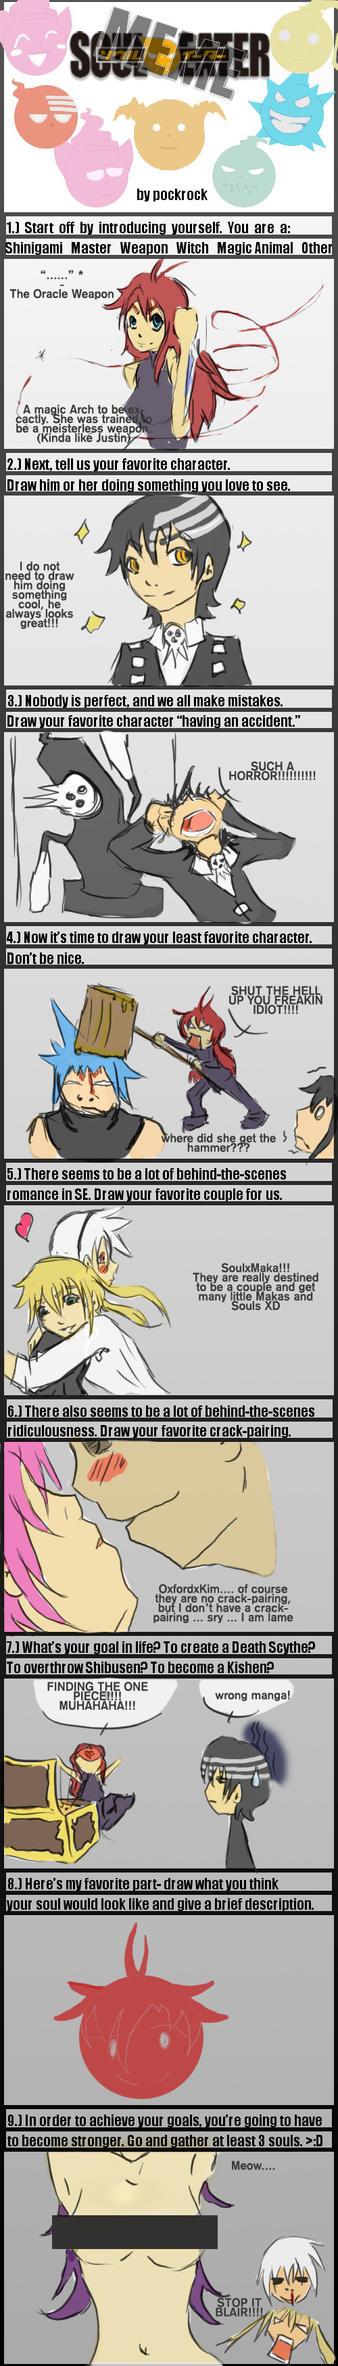 Soul Eater Meme by edogori